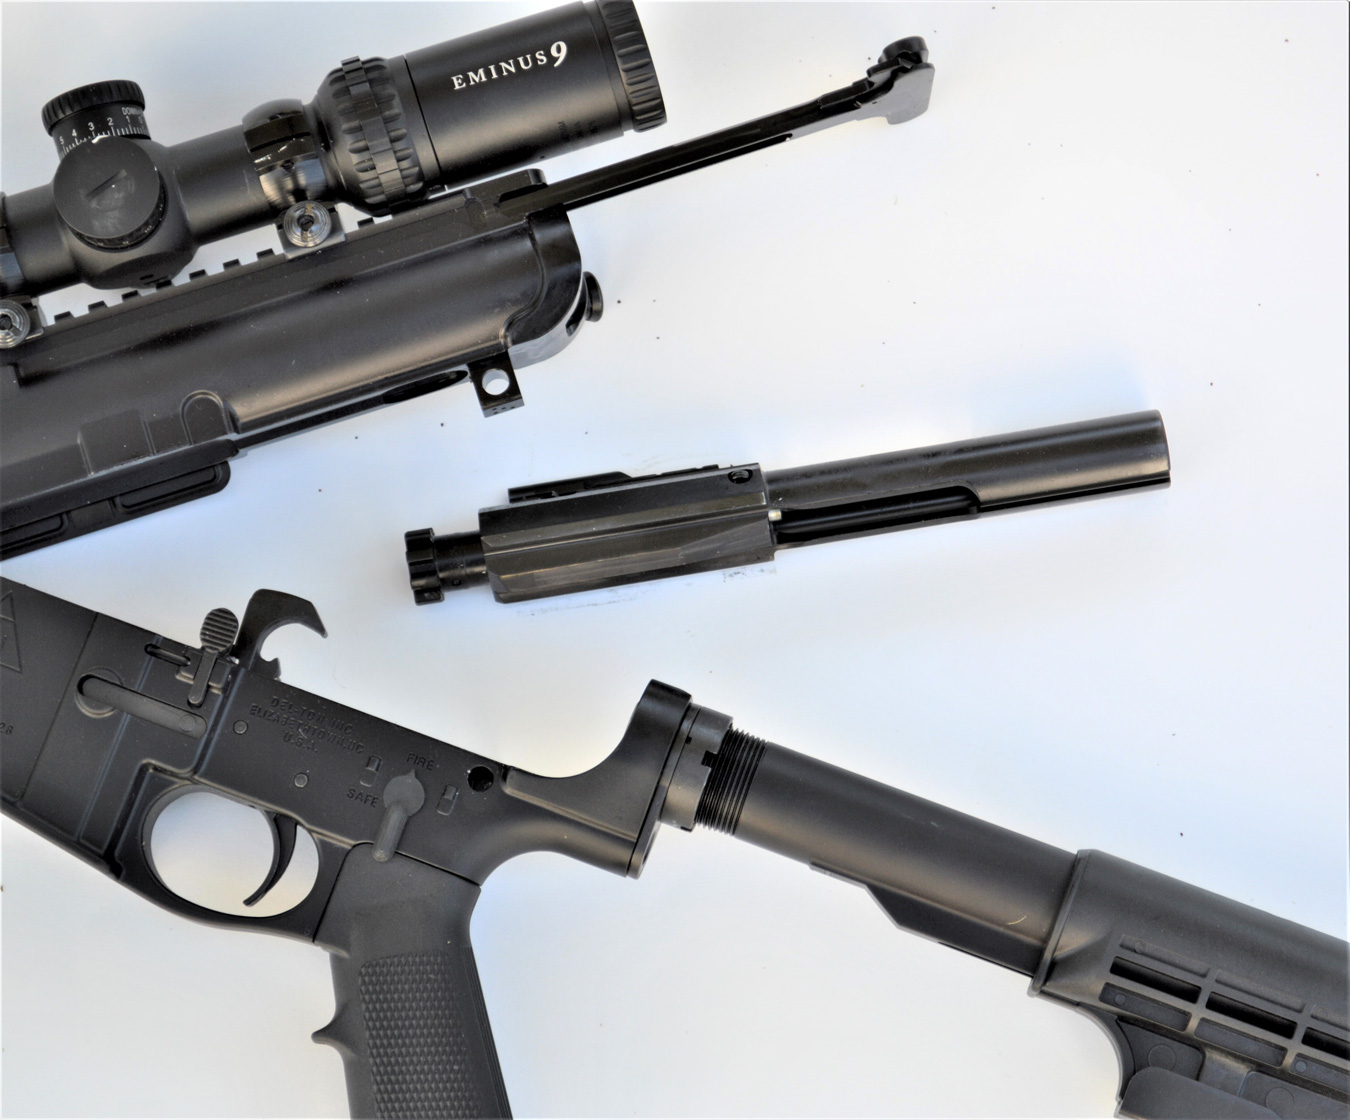 Fieldstripped AR-10 rifle